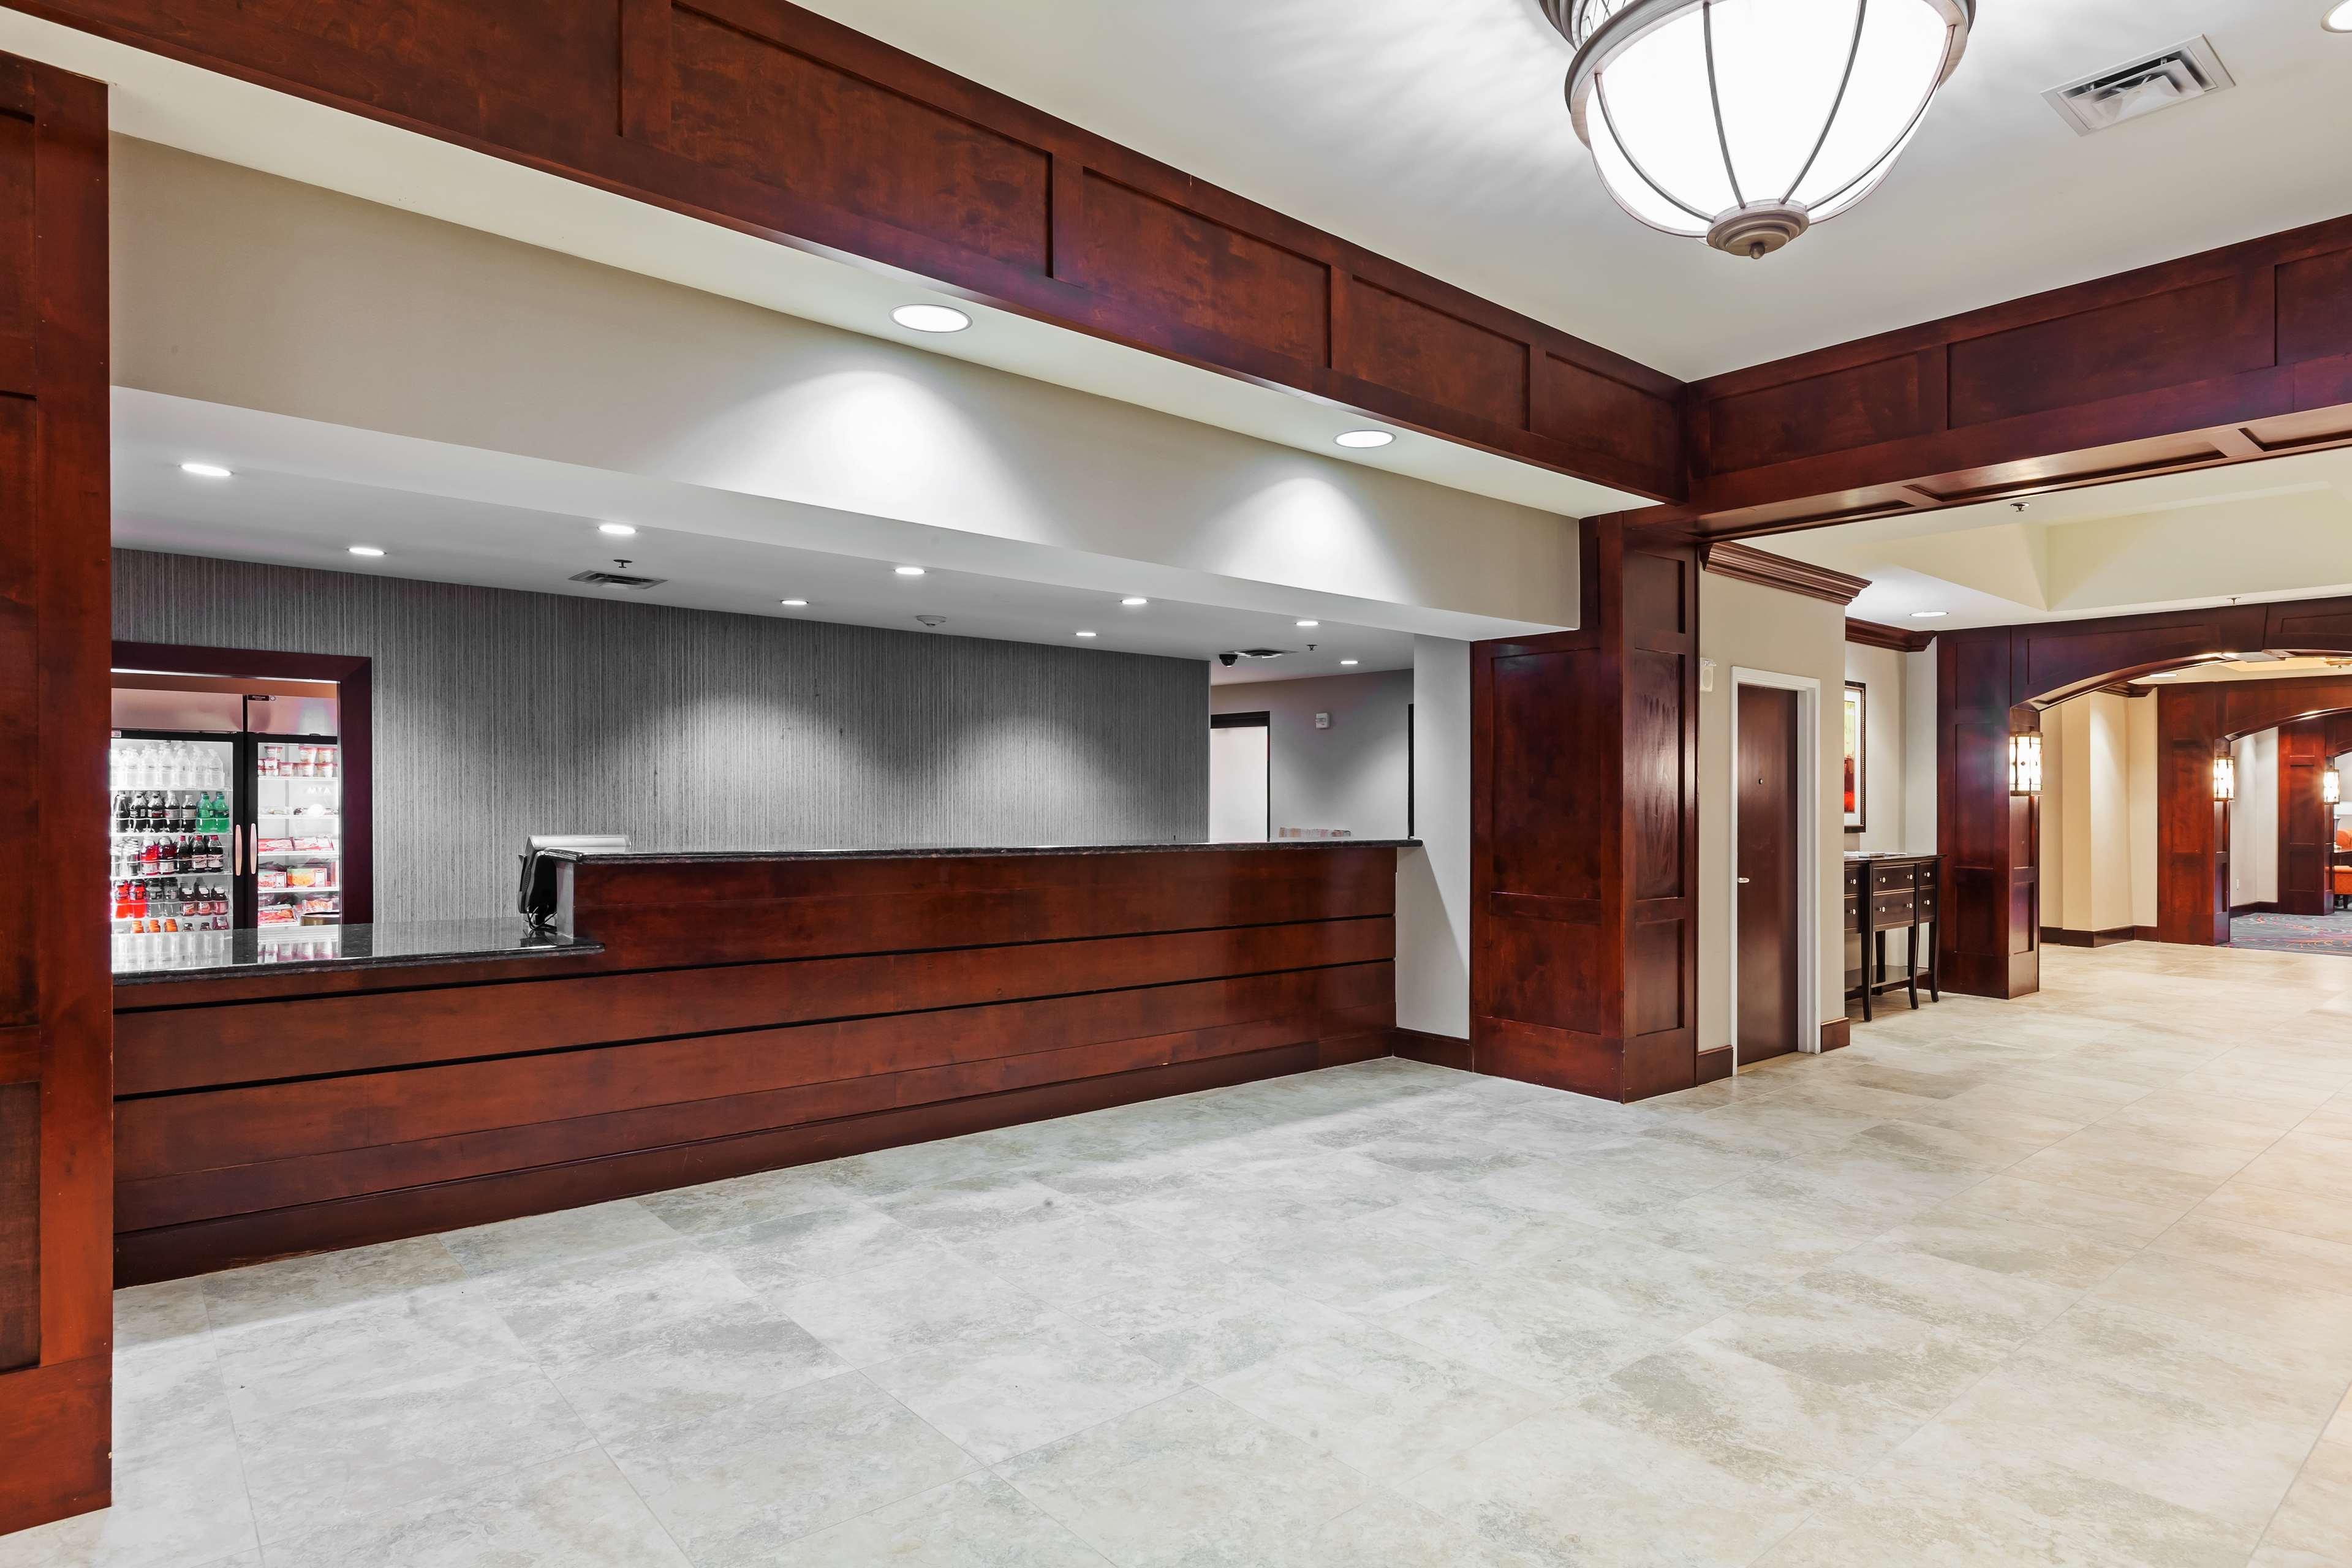 Hilton Waco image 18